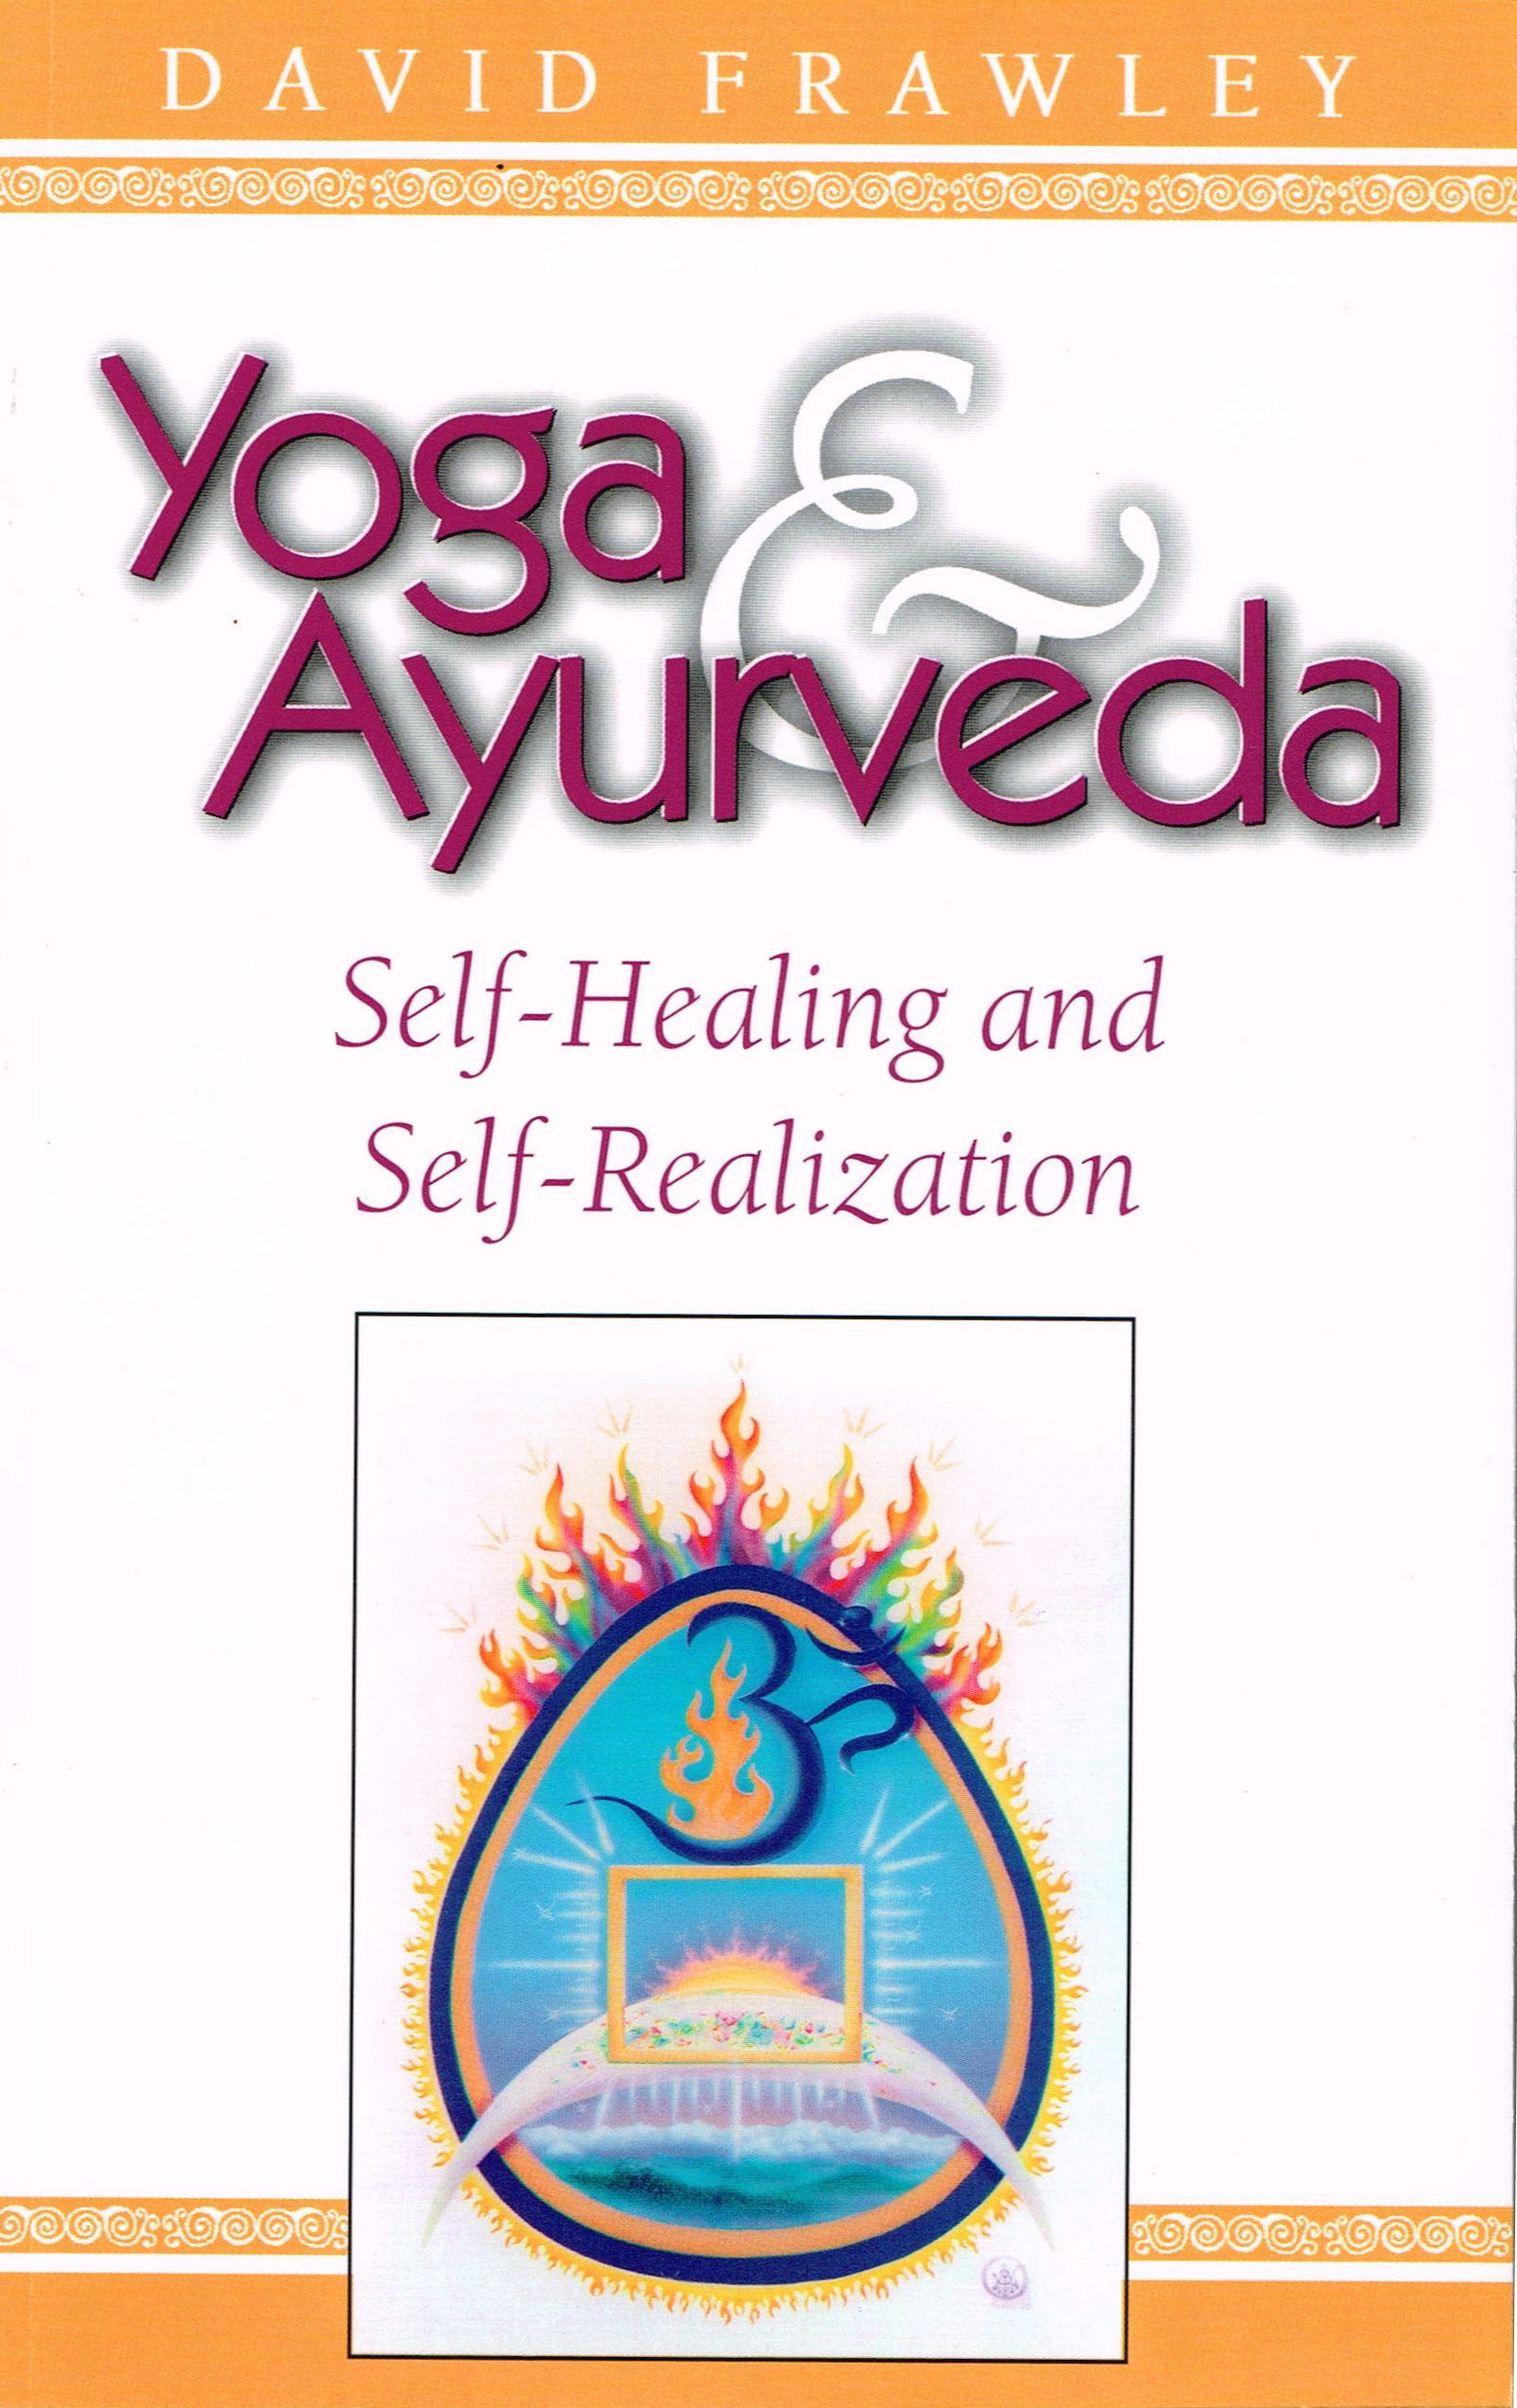 A photo of Yoga & Ayurveda